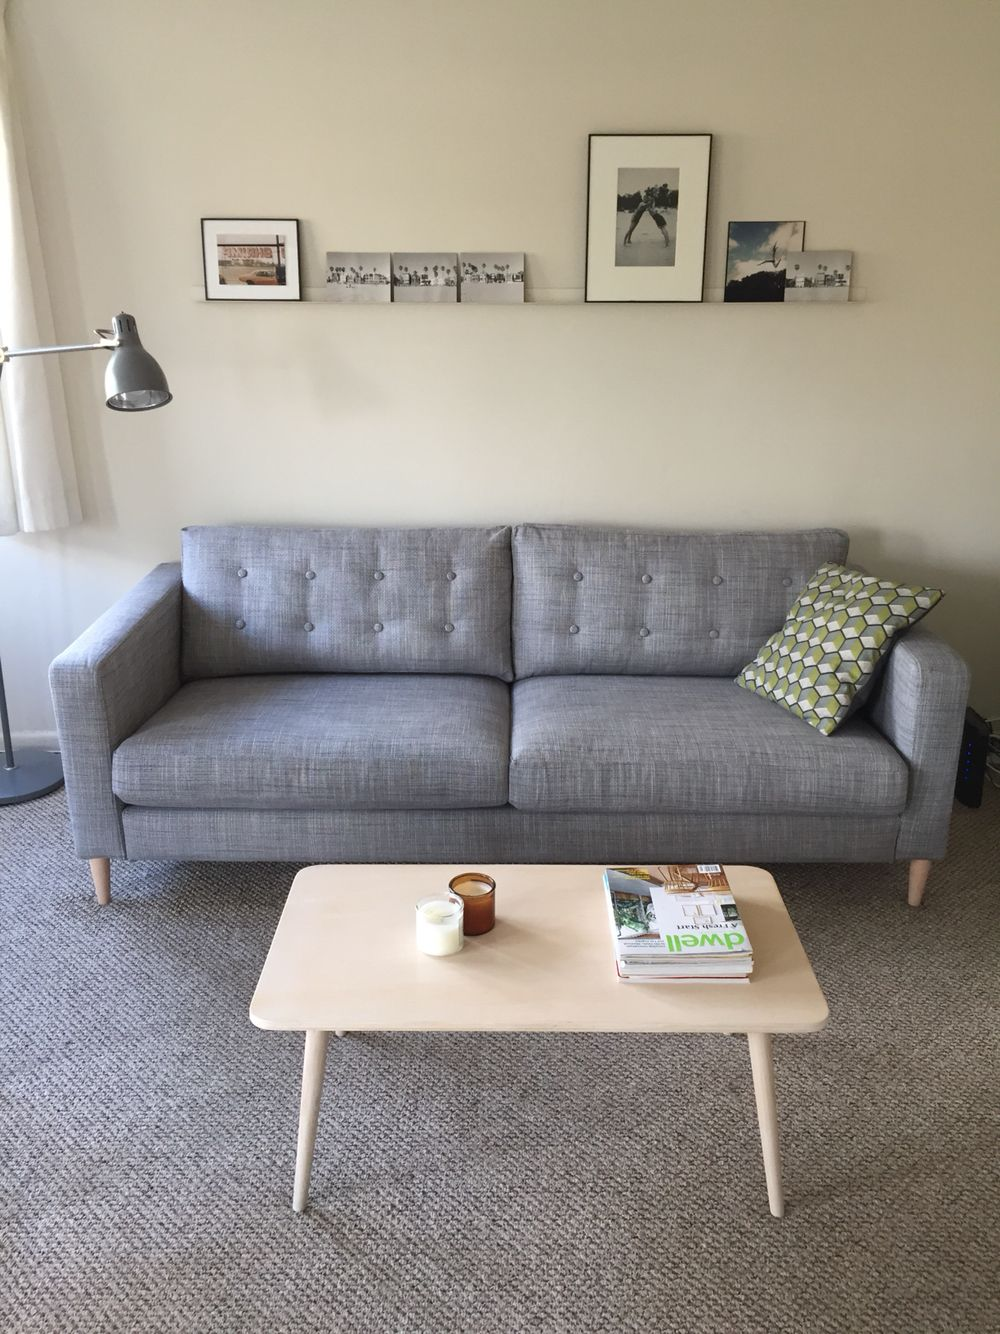 Ikea Karlstad Sofa Hack Legs Changed Tufting Los Angeles Flat